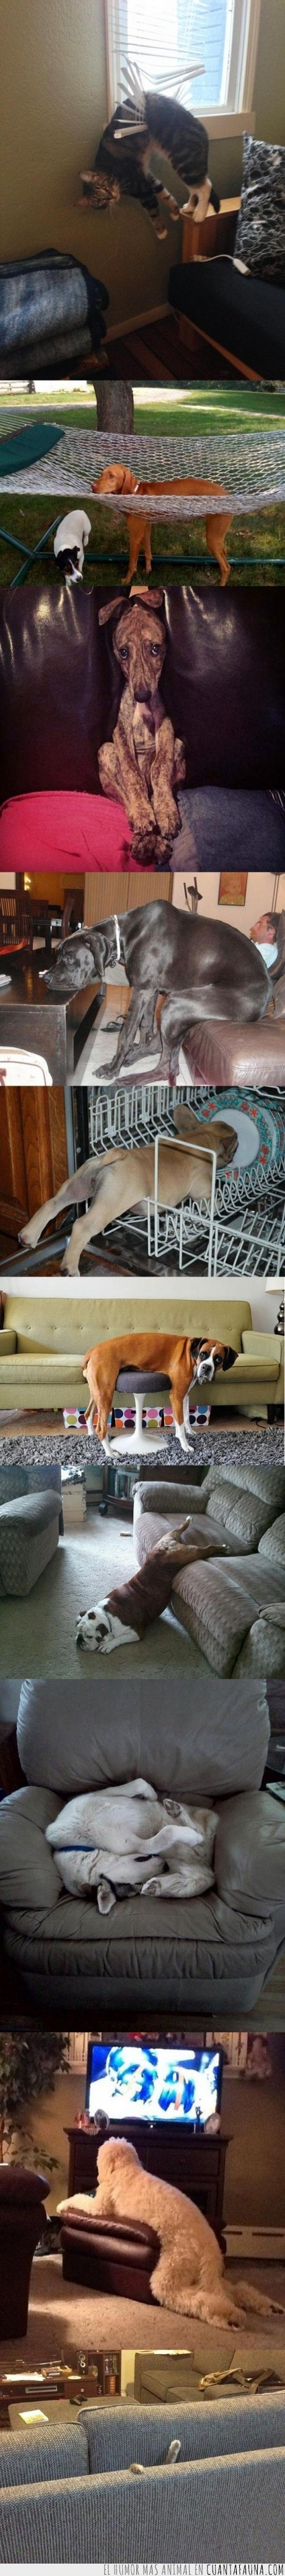 aprietos,banco,colgado,comodidad,dormir,gato,grande,hamaca,humor,lavaplatos,mascota,mueble,pequeño,perro,sillón,travesura,ventana,ver tele